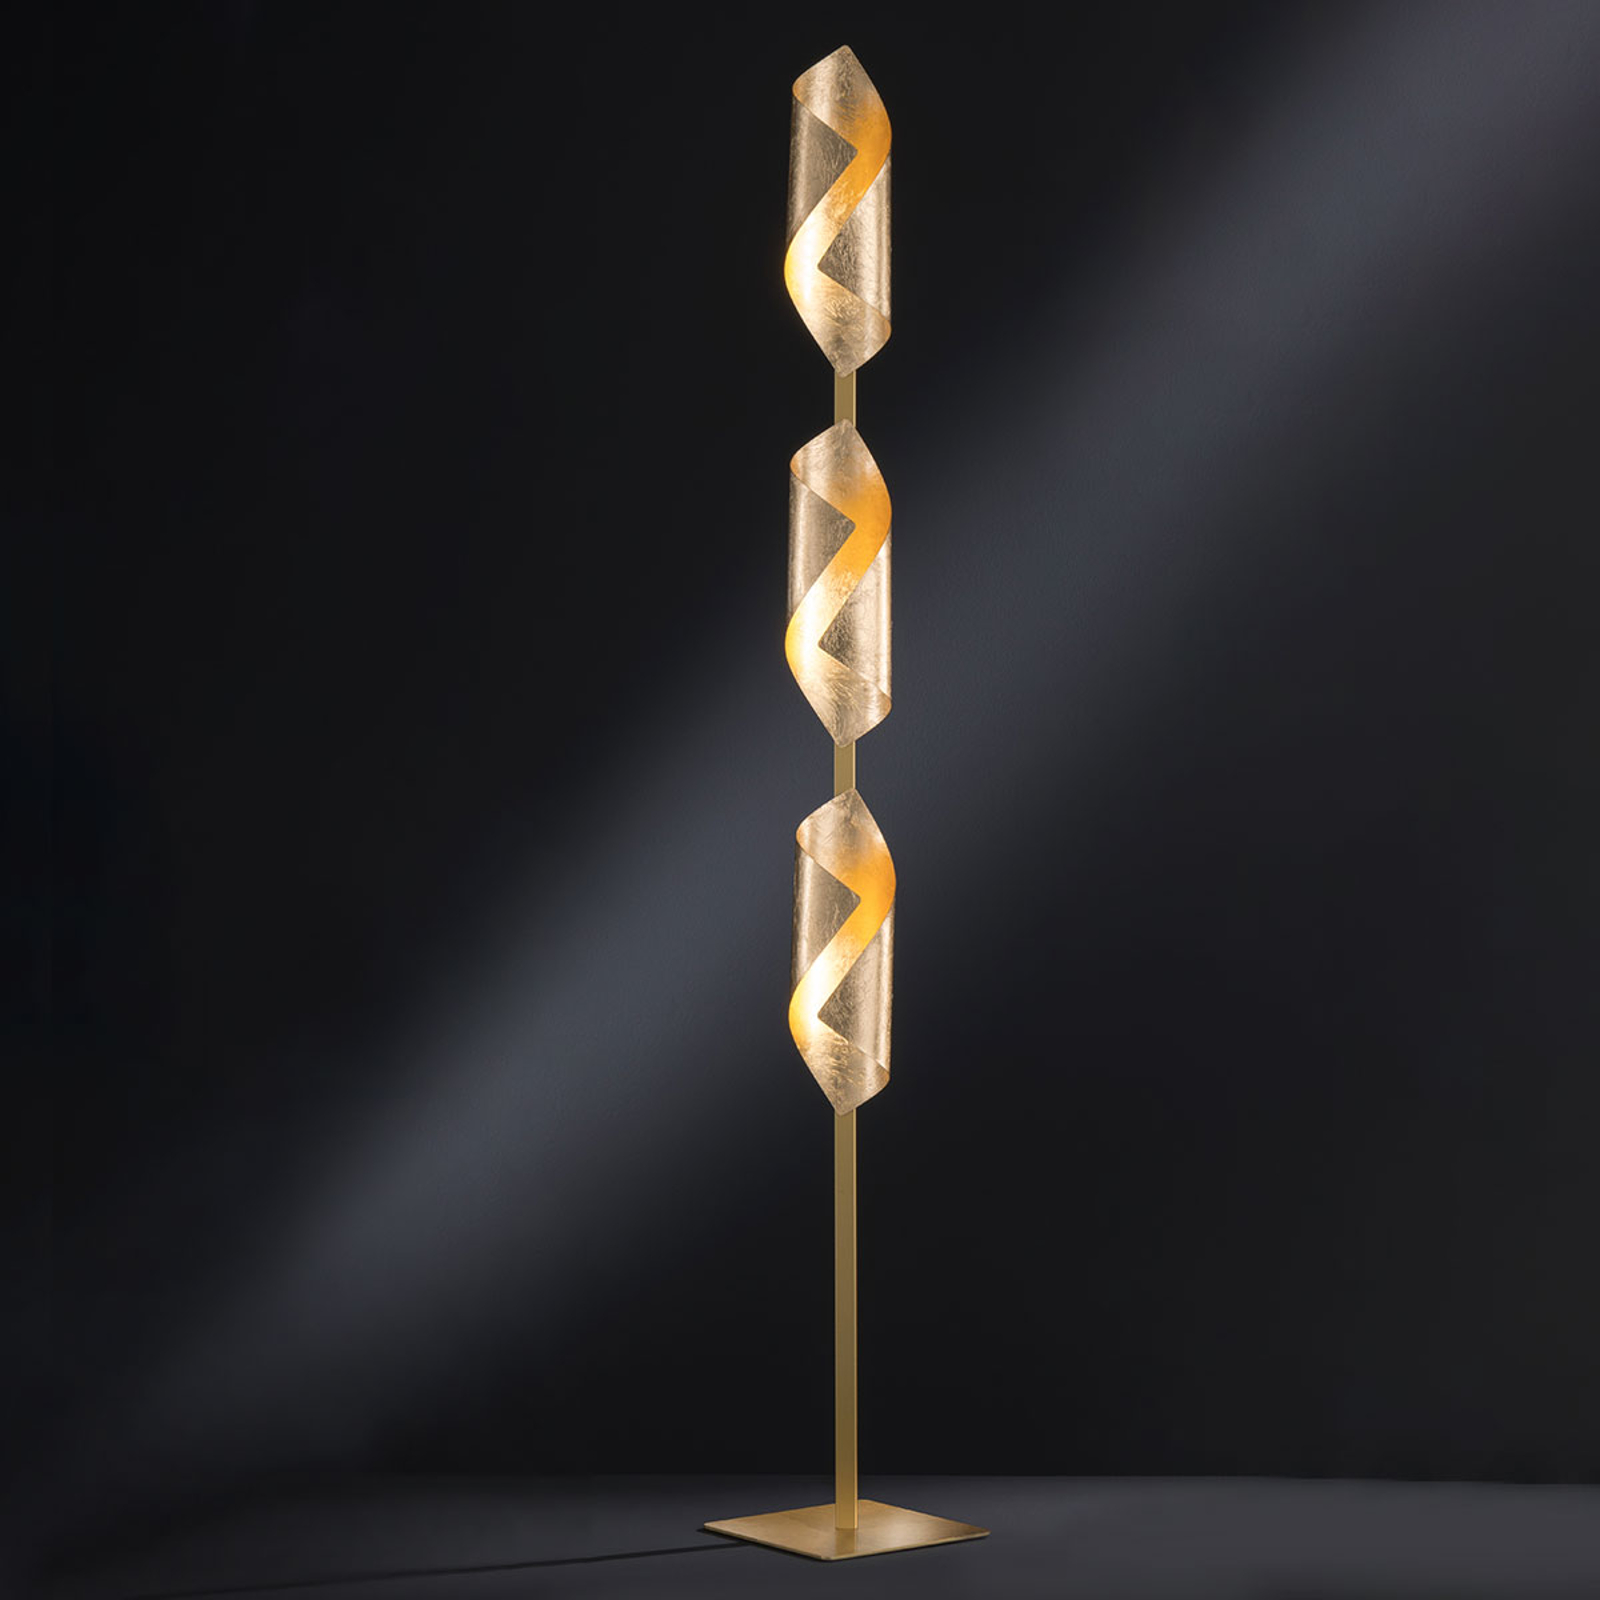 Lampadaire LED Safira en doré brillant